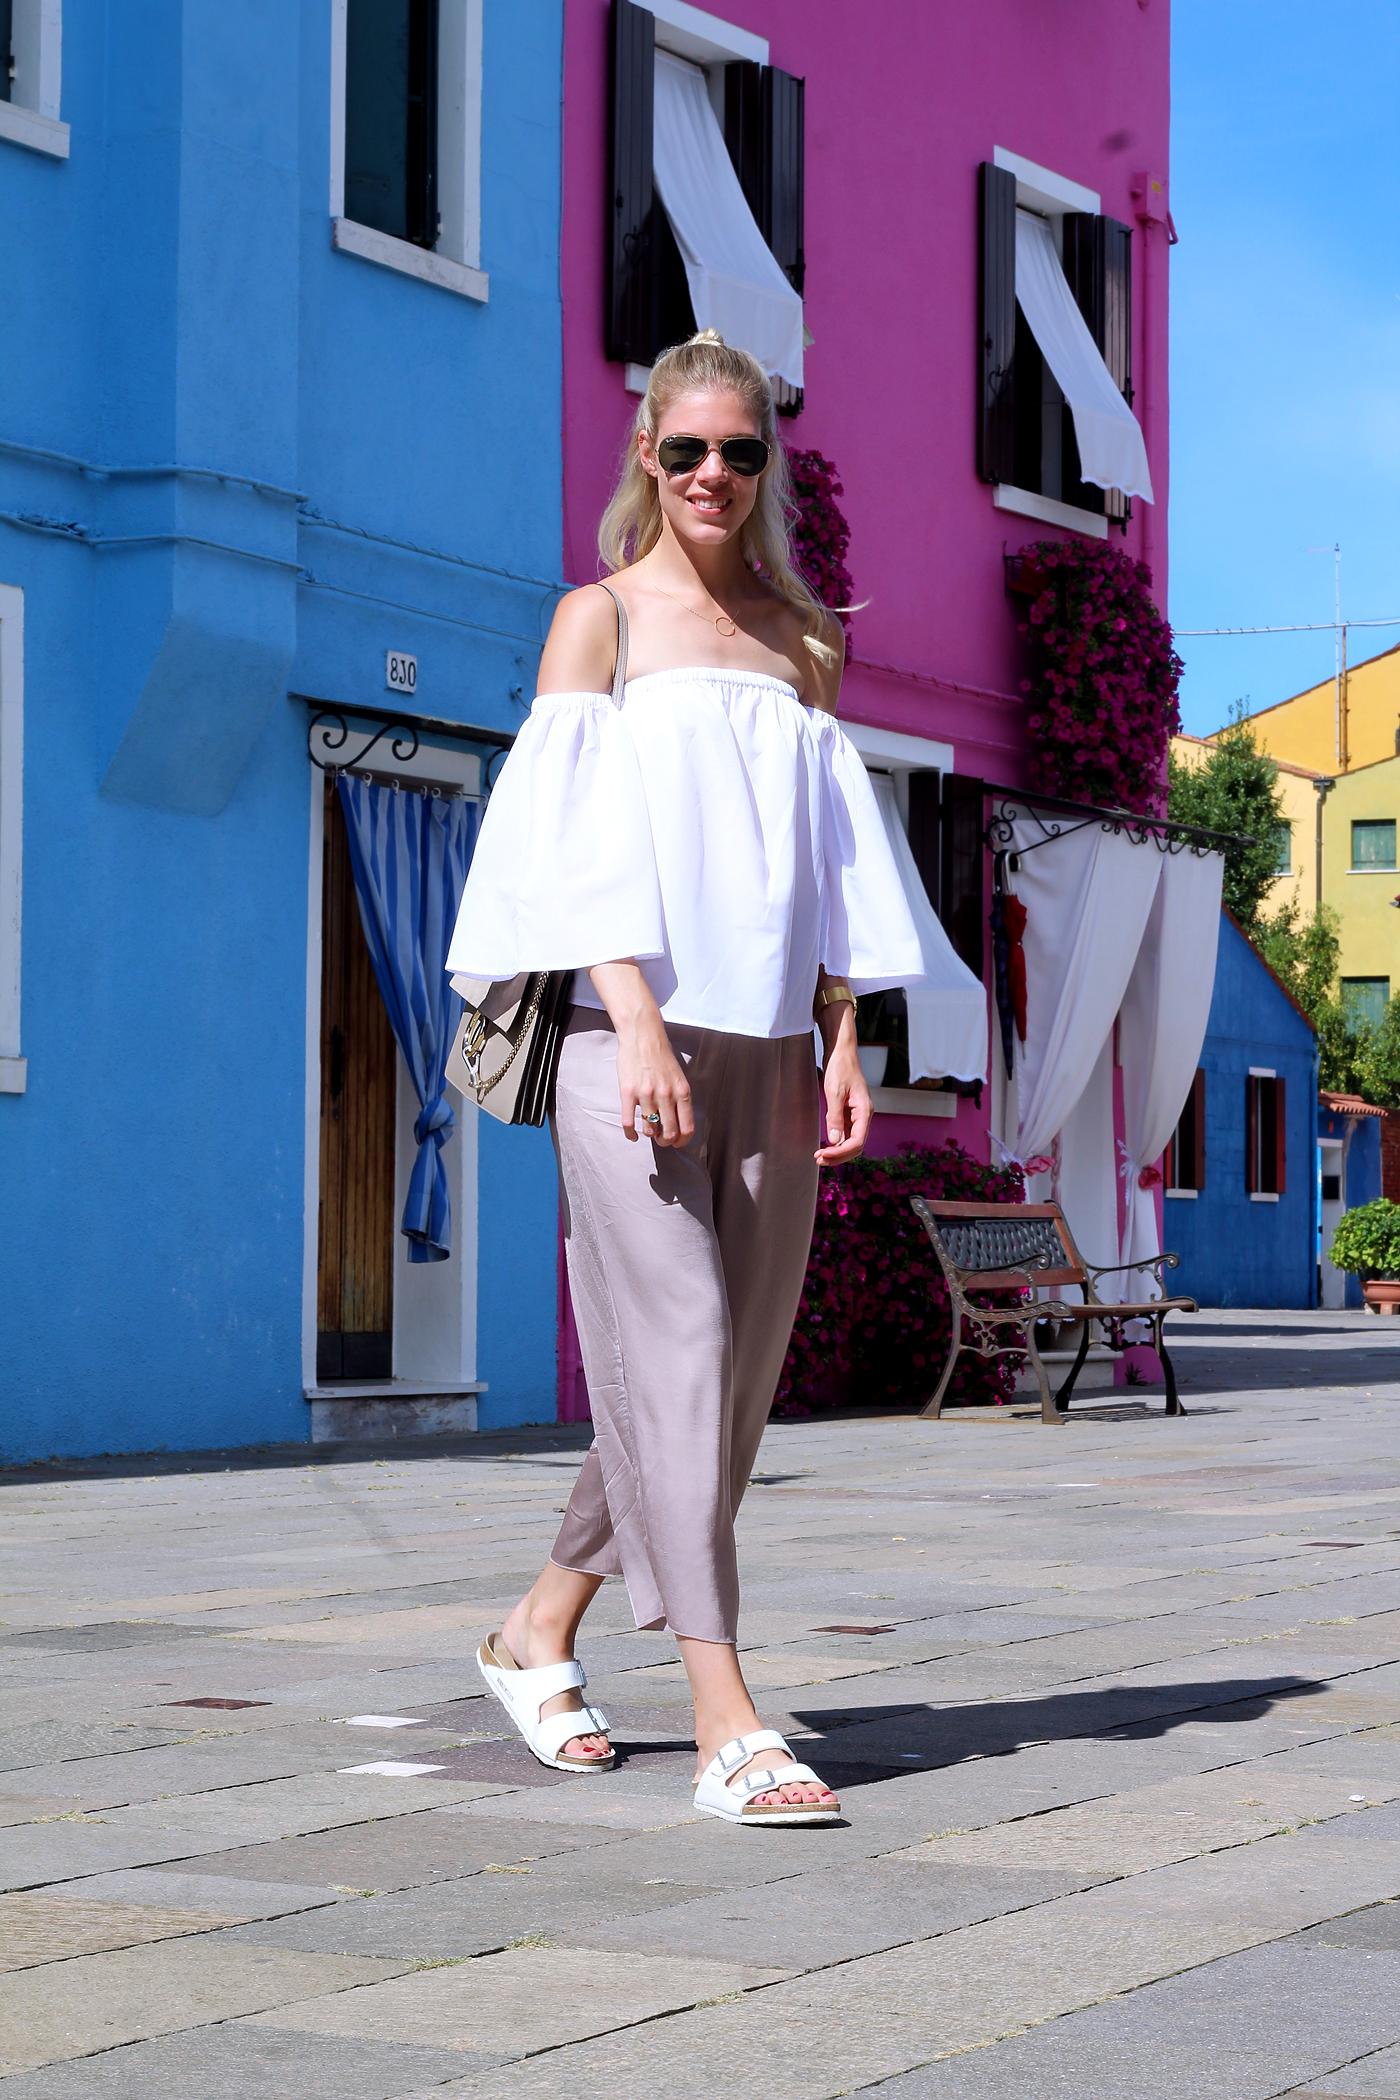 verenajulia_burano_fashionblog_culotte_chloe